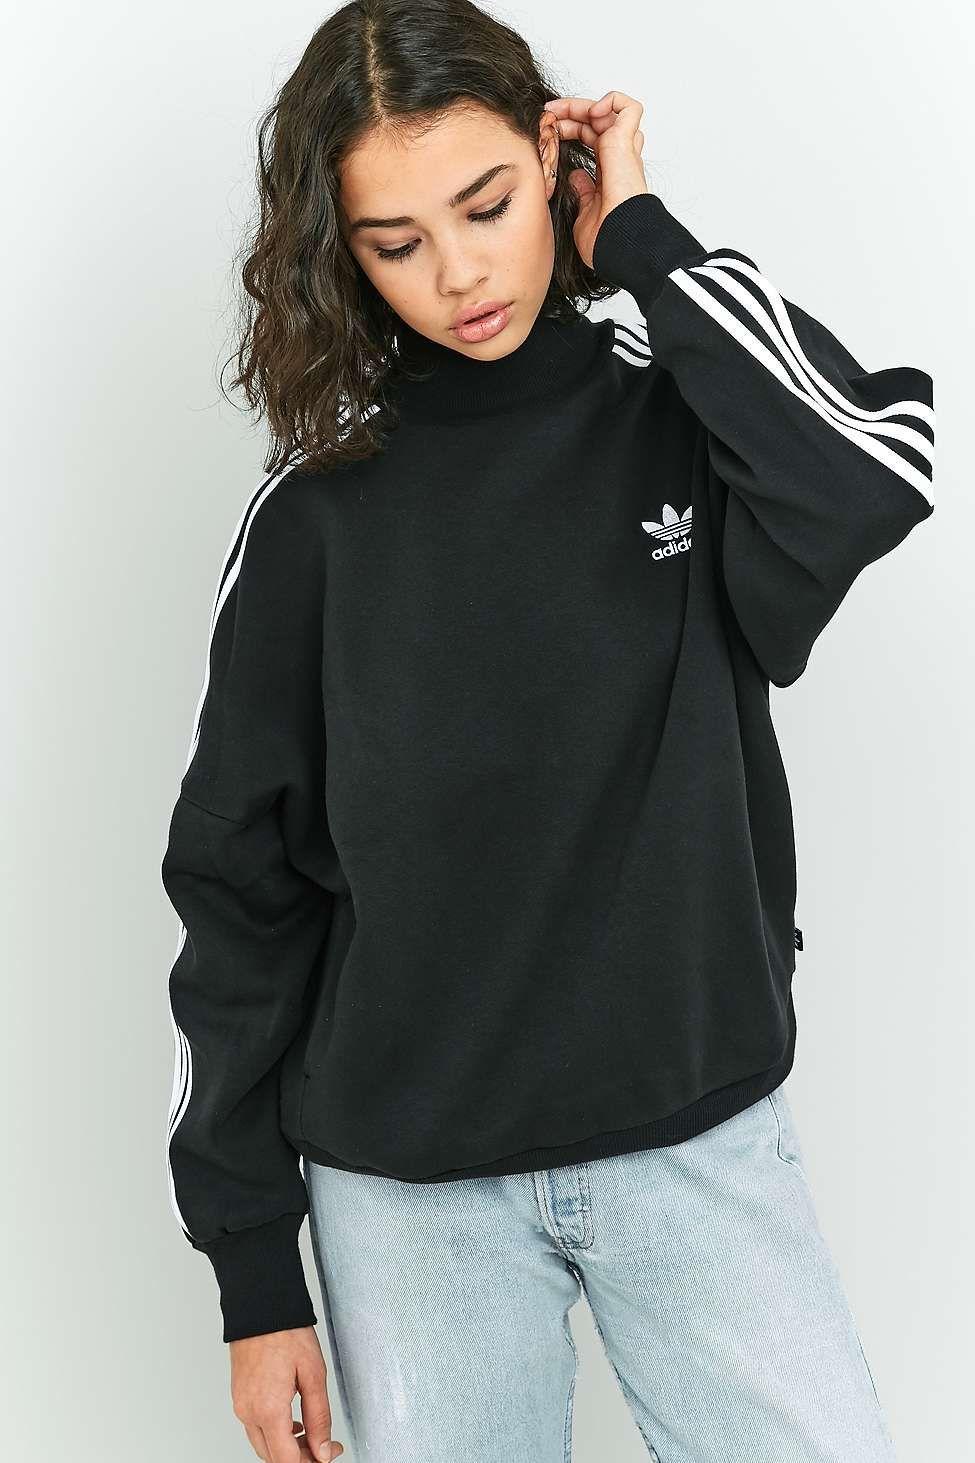 e3734bb14f379d Adidas Originals 3-Stripe Black Turtleneck Sweatshirt | Clothing ...